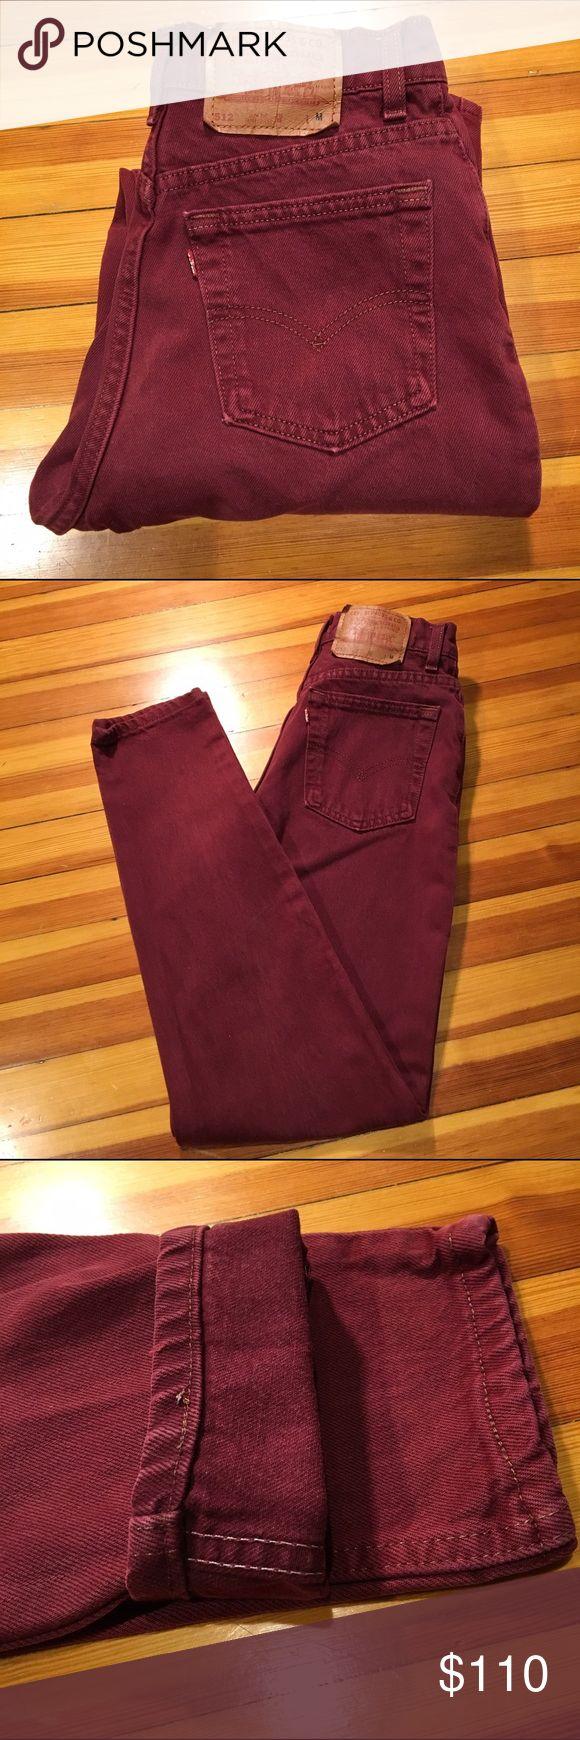 "Vintage 512 Levi's -Levi's 512 * High rise * Slim fit * Tapered leg * Vintage 2"" coin pocket * Selvedge stitch * Burgundy wine color Levi's Jeans"